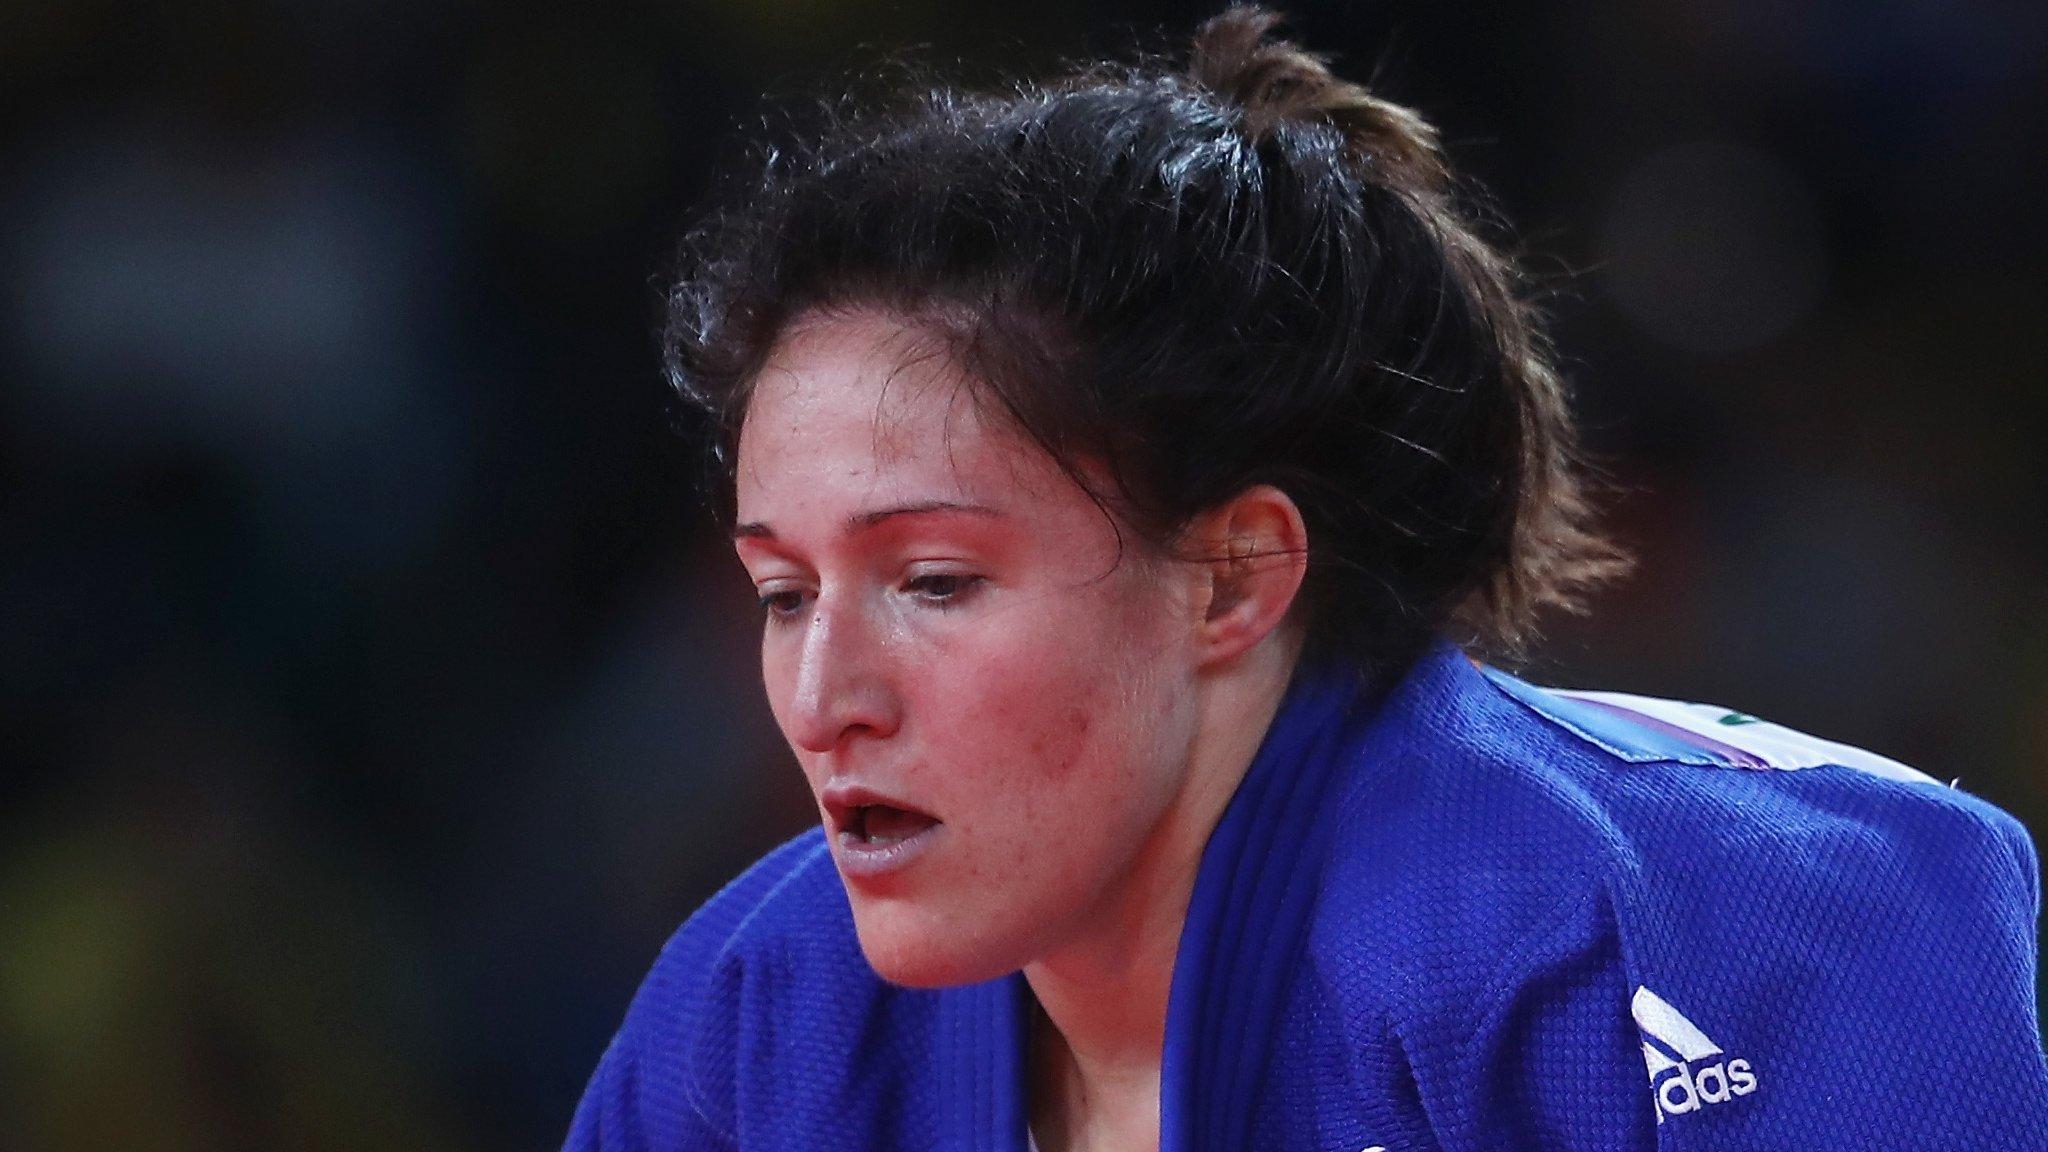 World Judo Championships: Natalie Powell suffers shock defeat in Baku